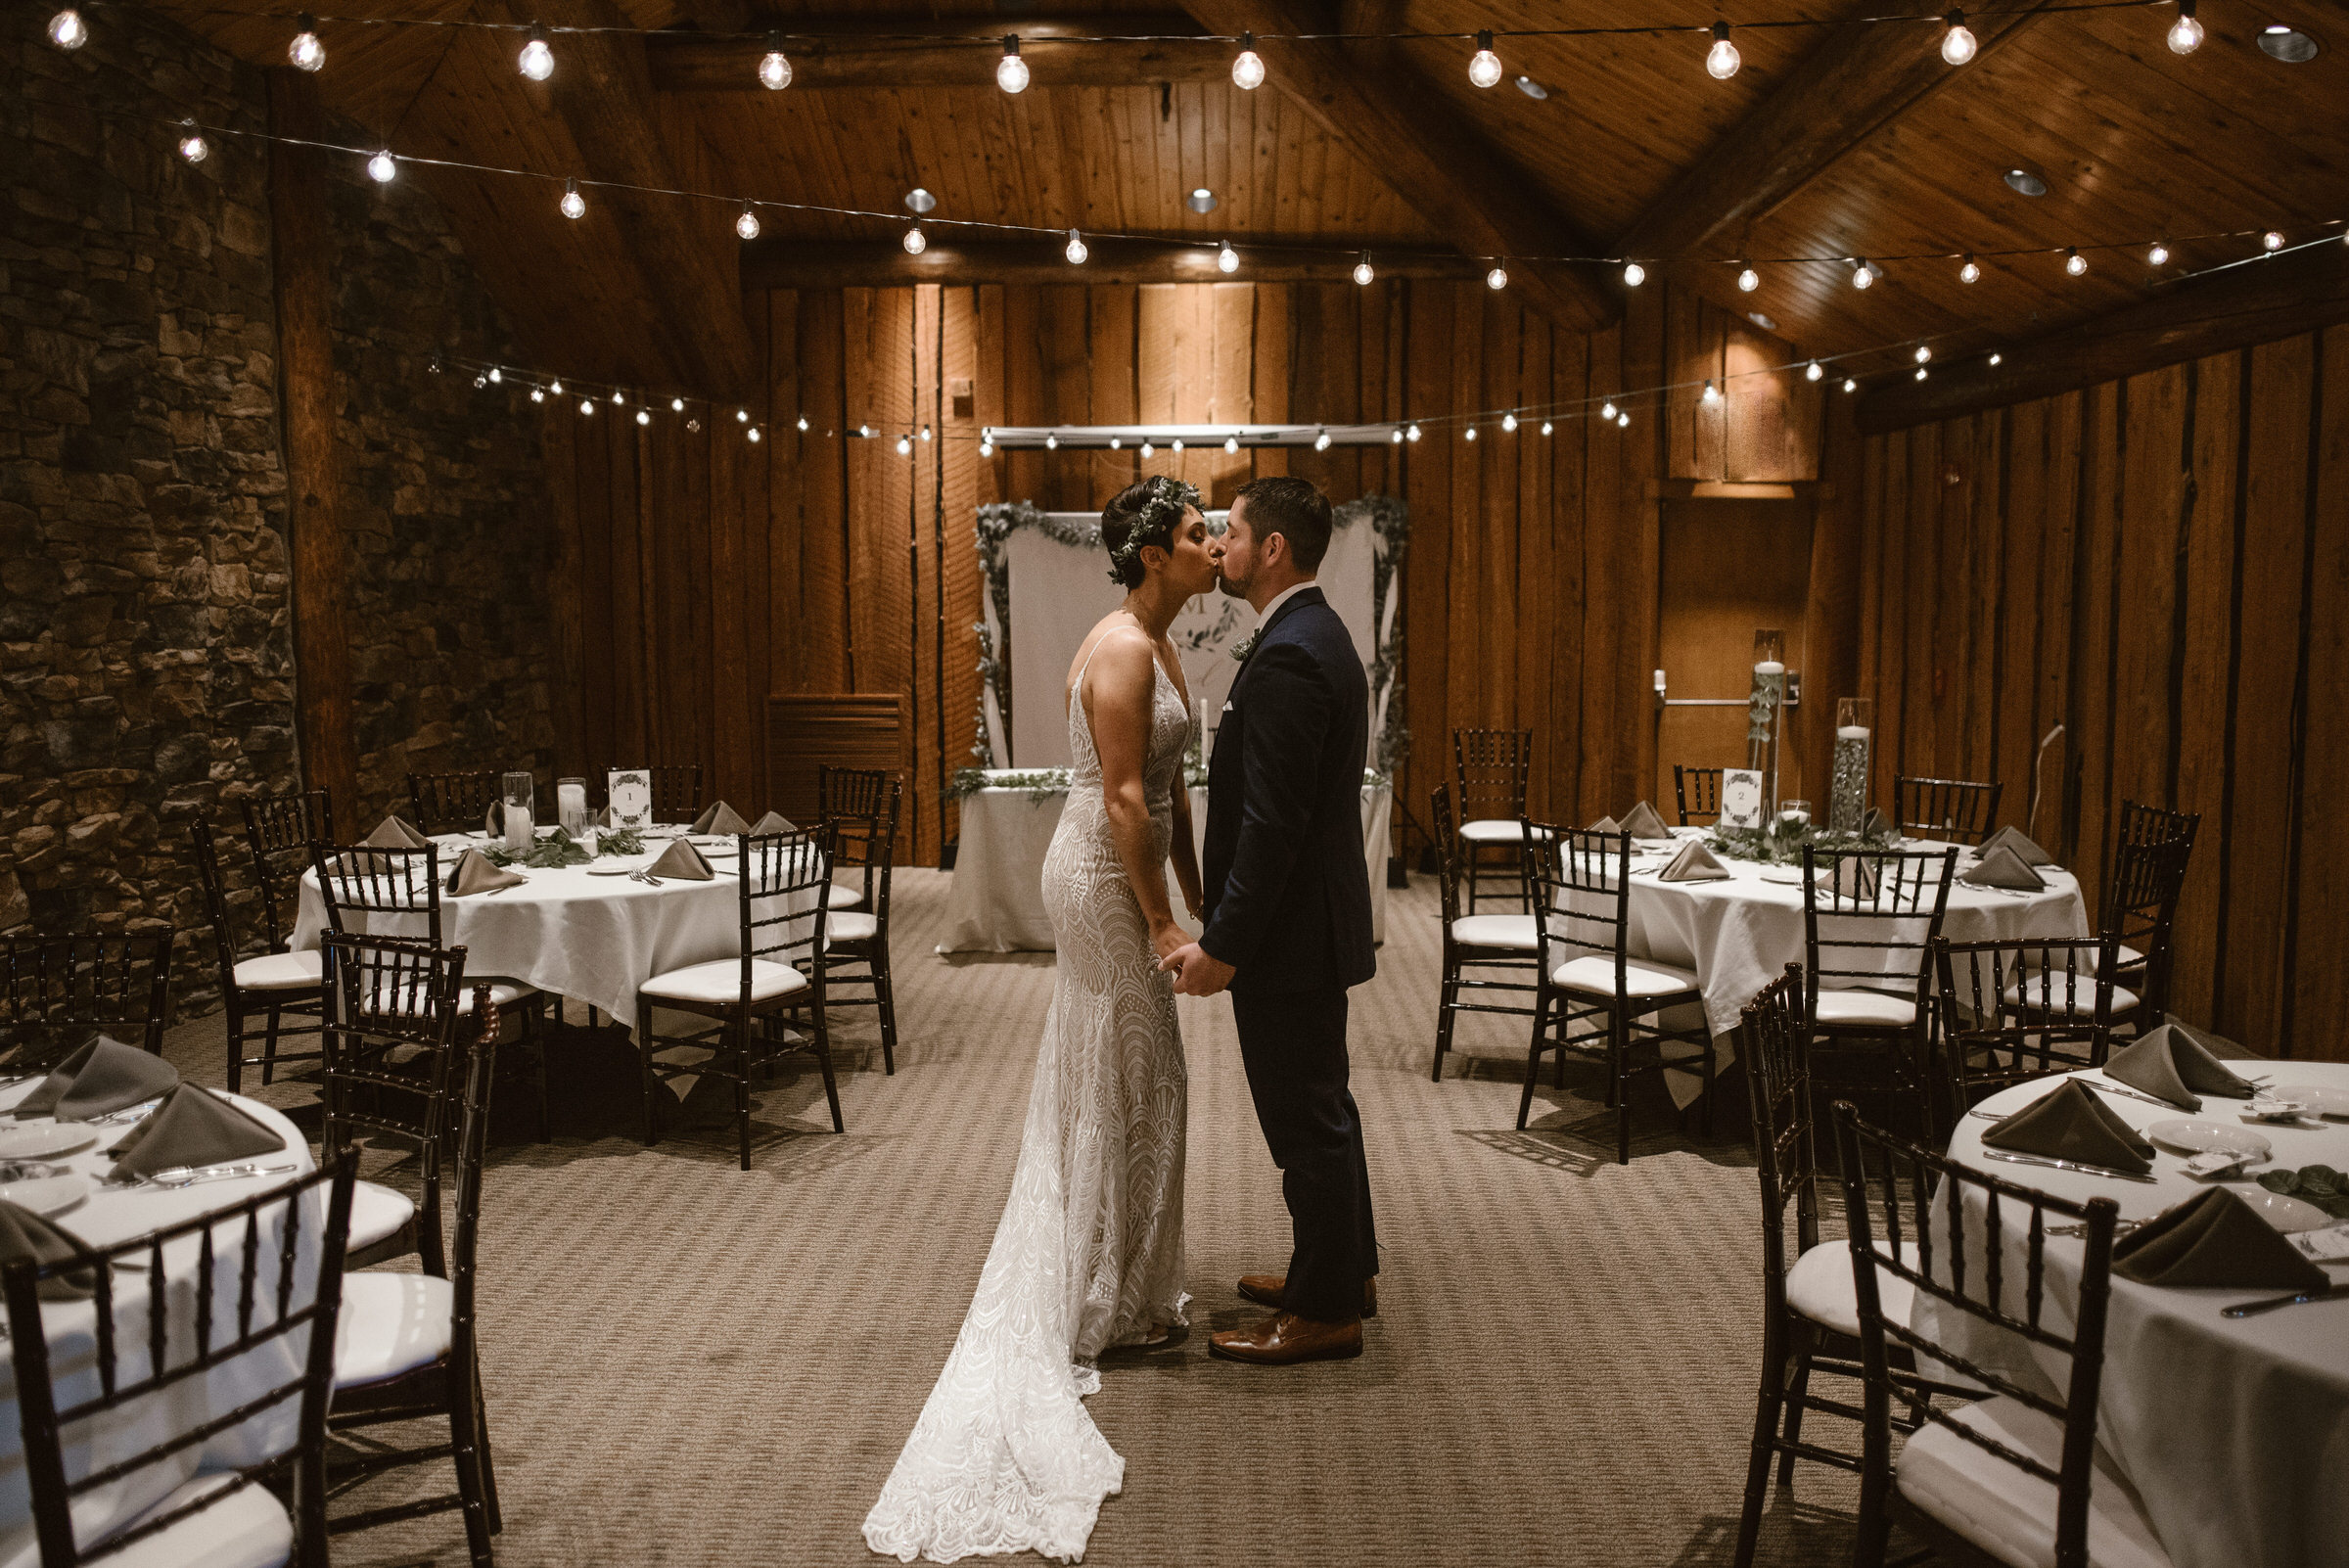 Wilderness-Ridge-Lincoln-Nebraska-Wedding-Kaylie-Sirek-Photography-037.jpg